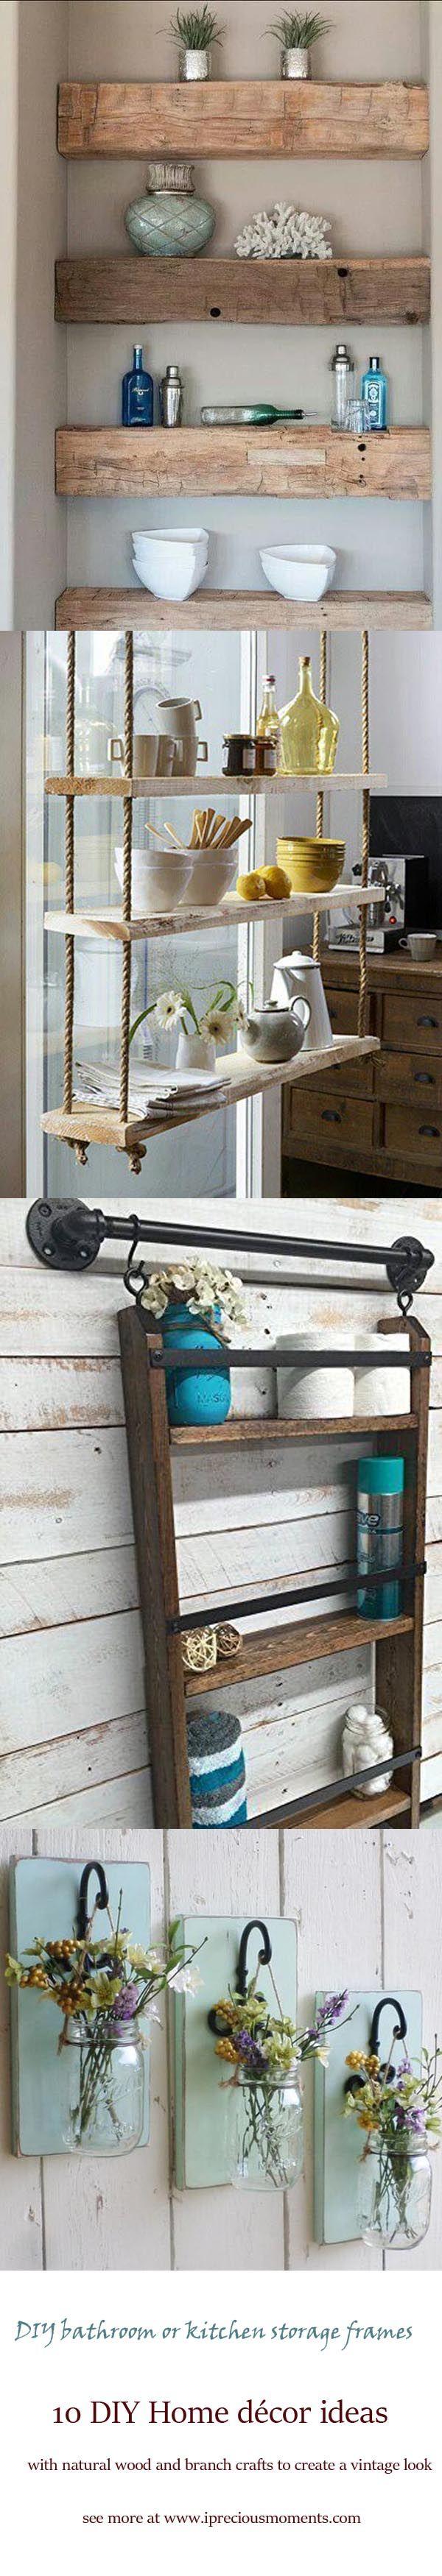 24175ba30287679cc7fb4d316b346f22  diy home diy bathroom Top Result 50 Best Of Kroger Patio Furniture Gallery 2017 Pkt6